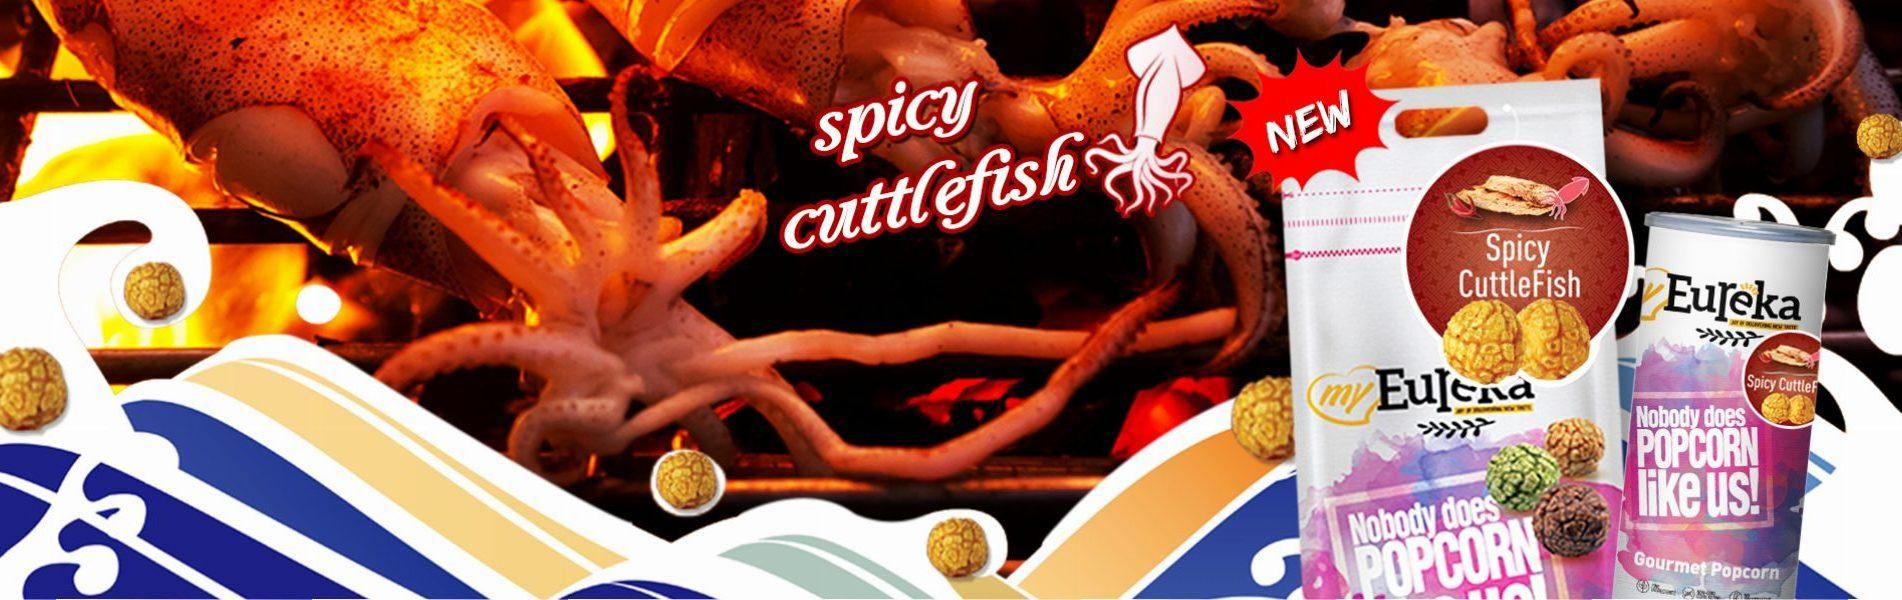 Eureka Snack Spicy Cuttlefish Popcorn